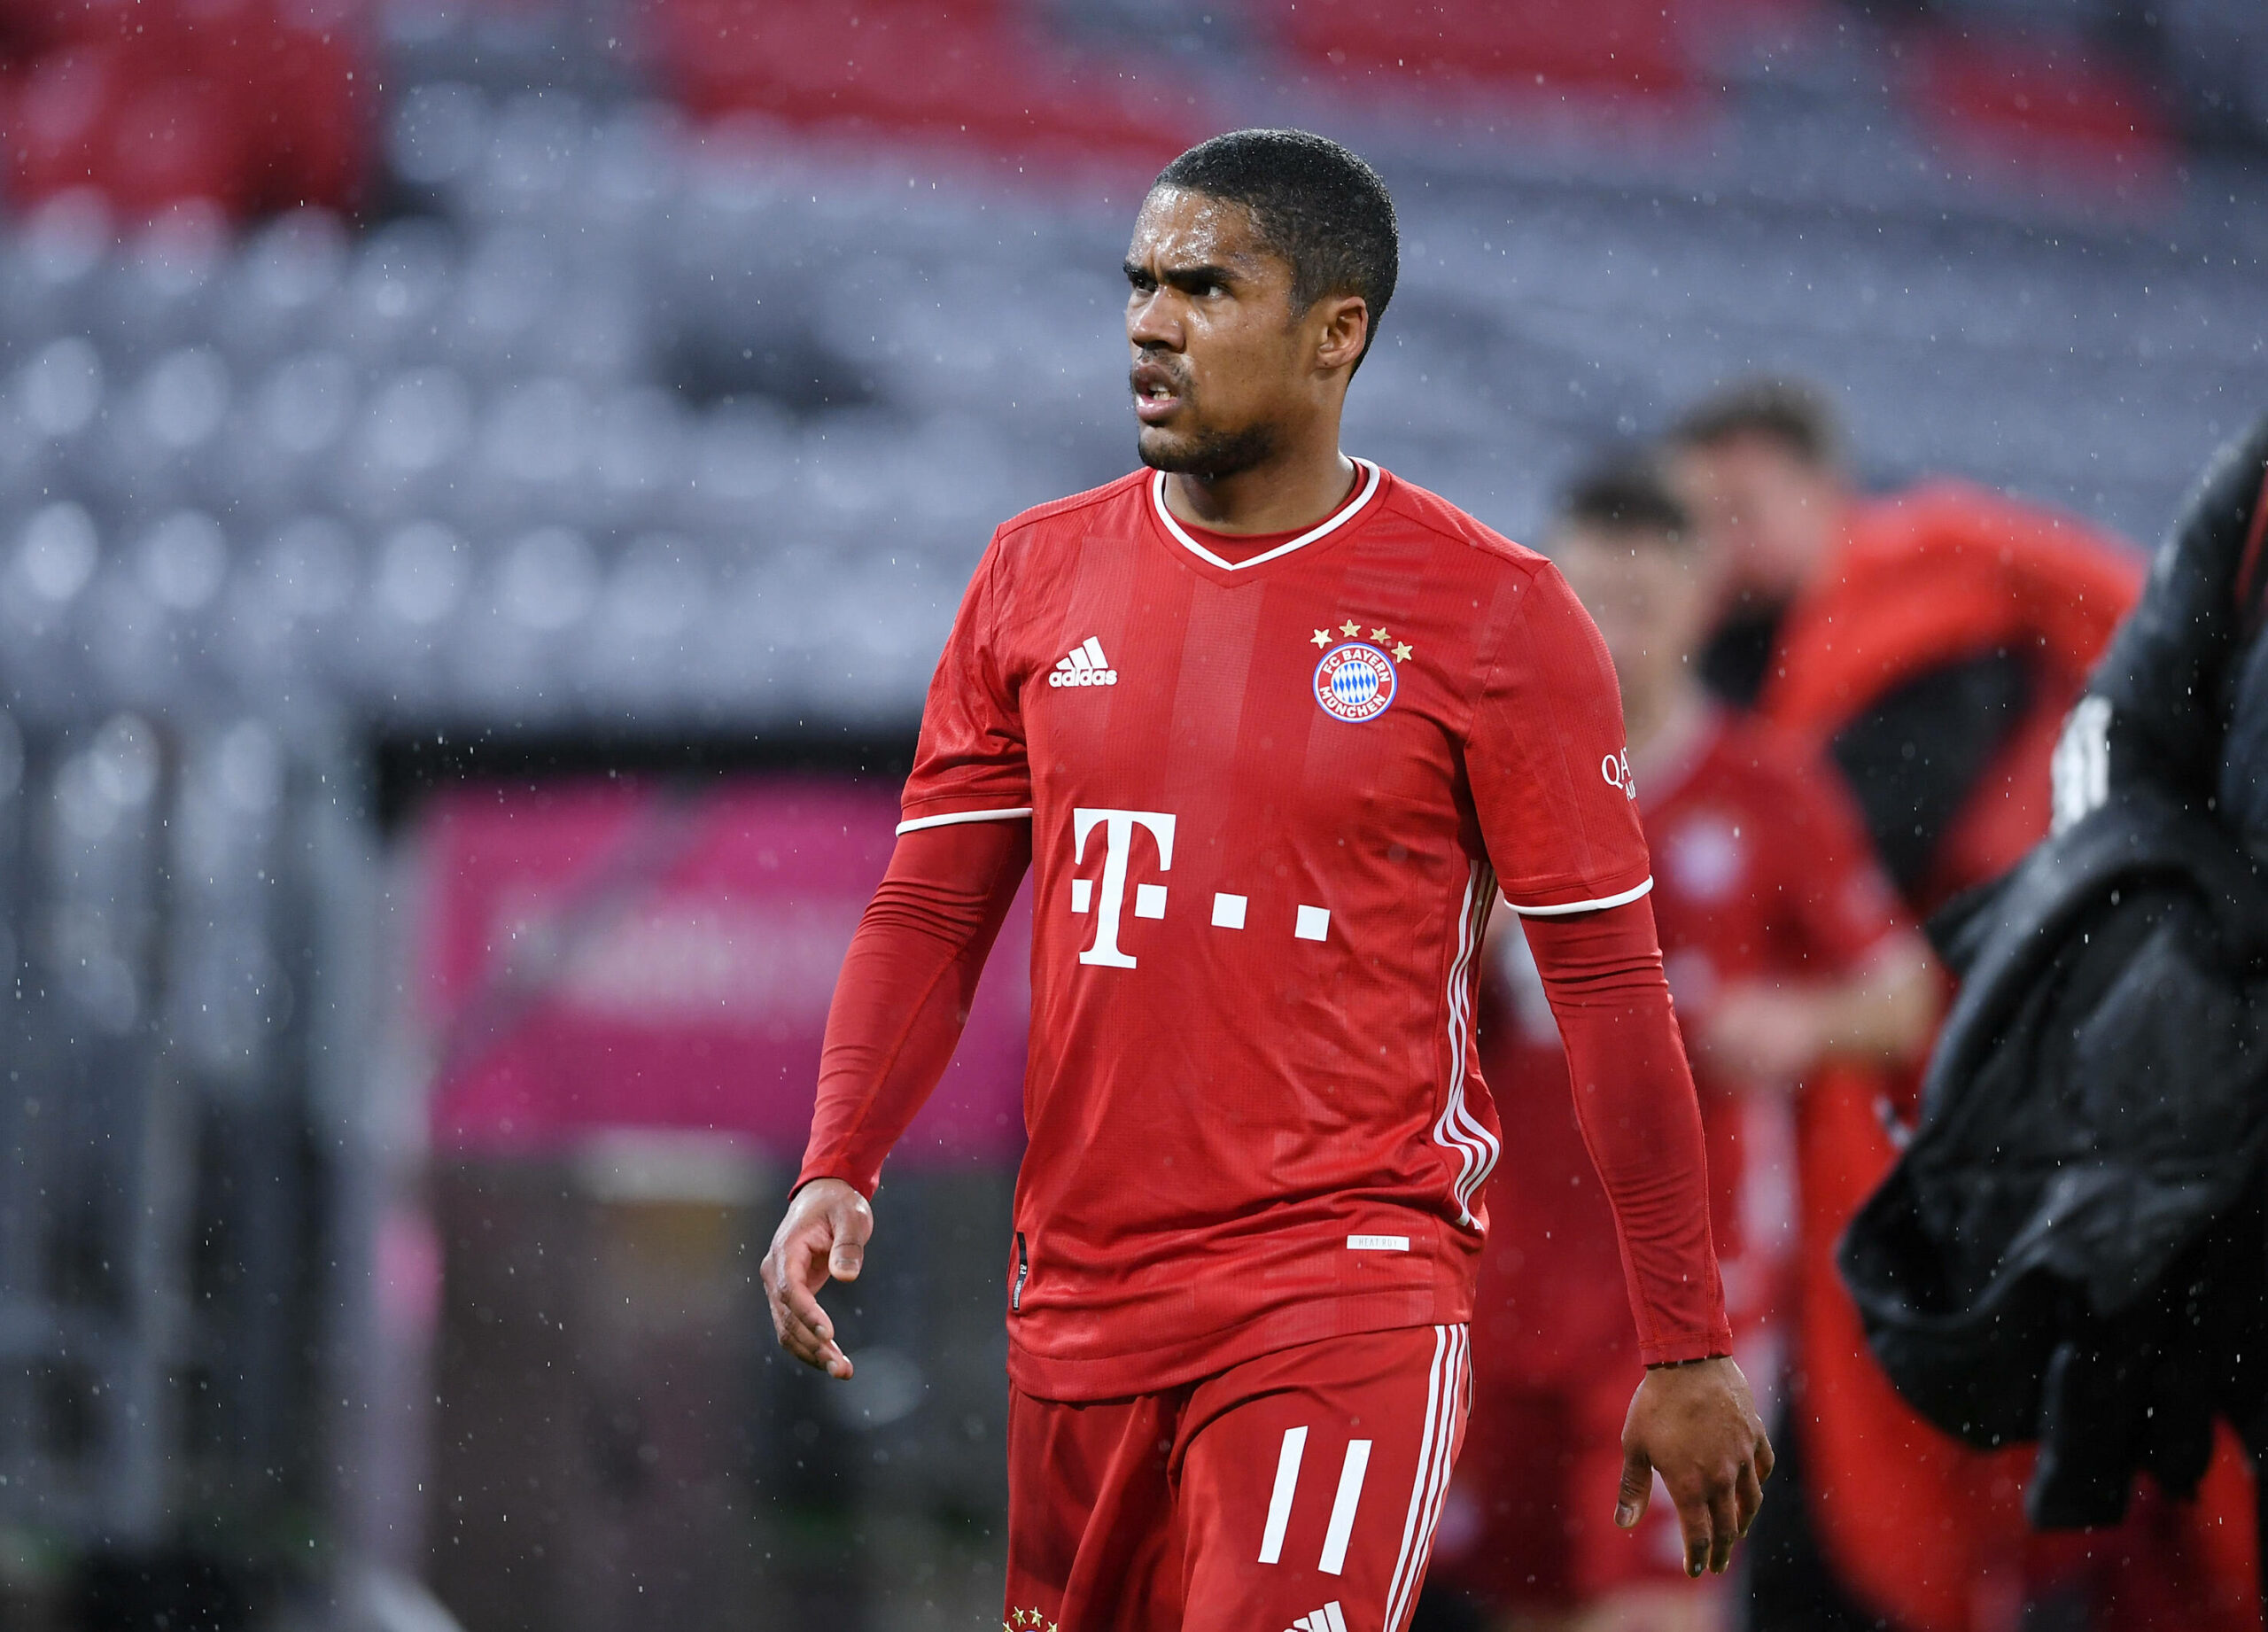 Douglas Costa vom FC Bayern